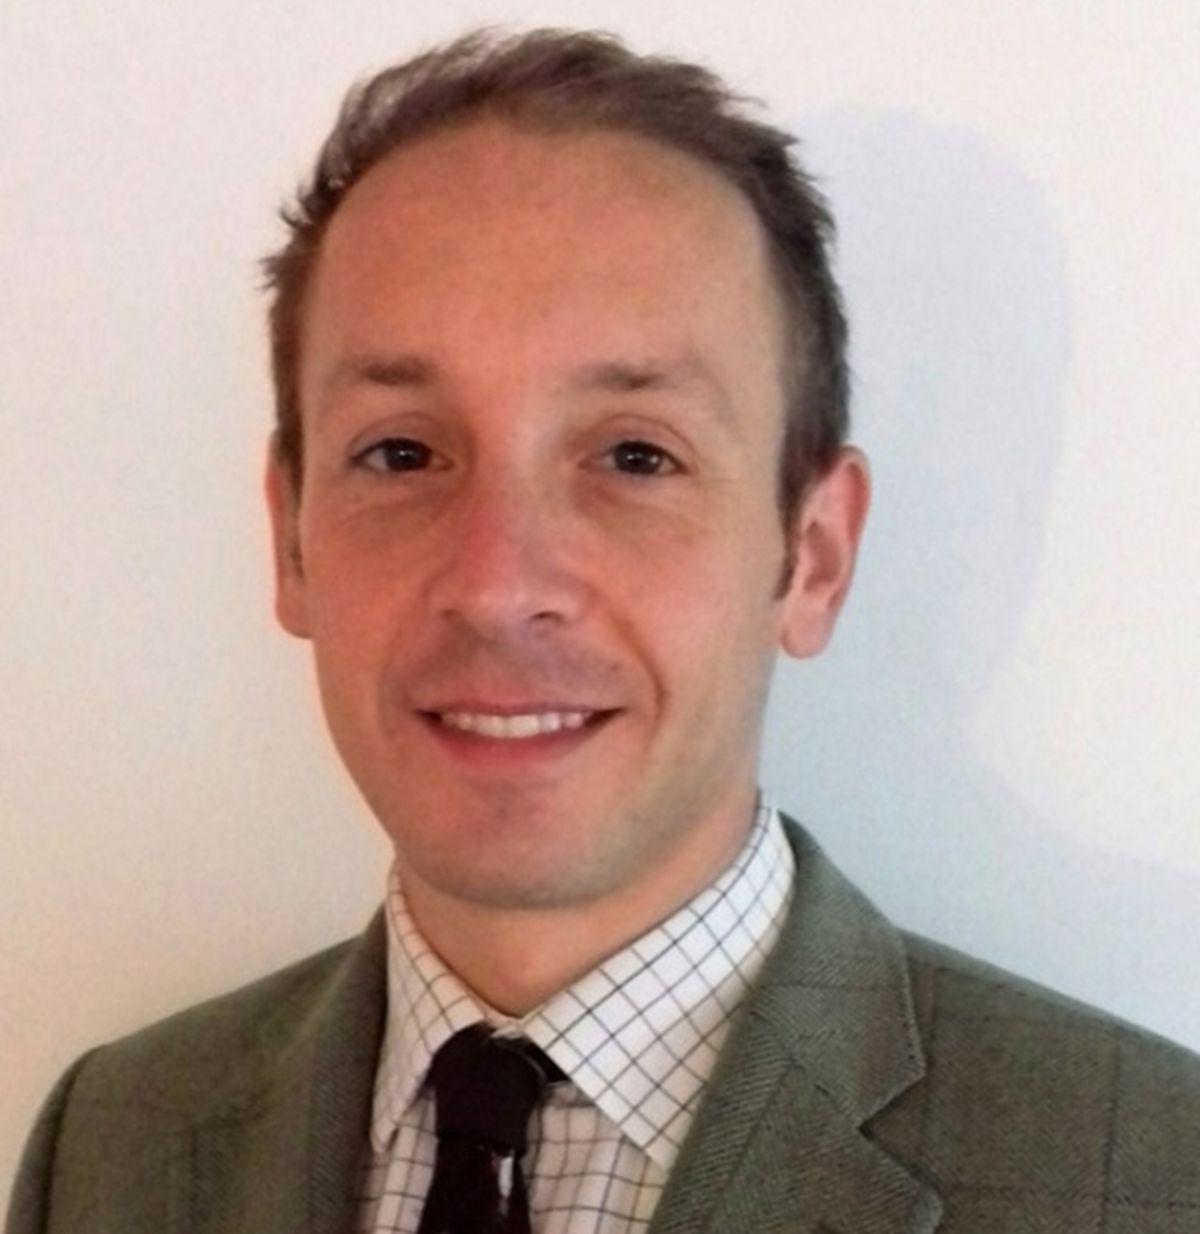 Edward Randall, Fisher German LLP